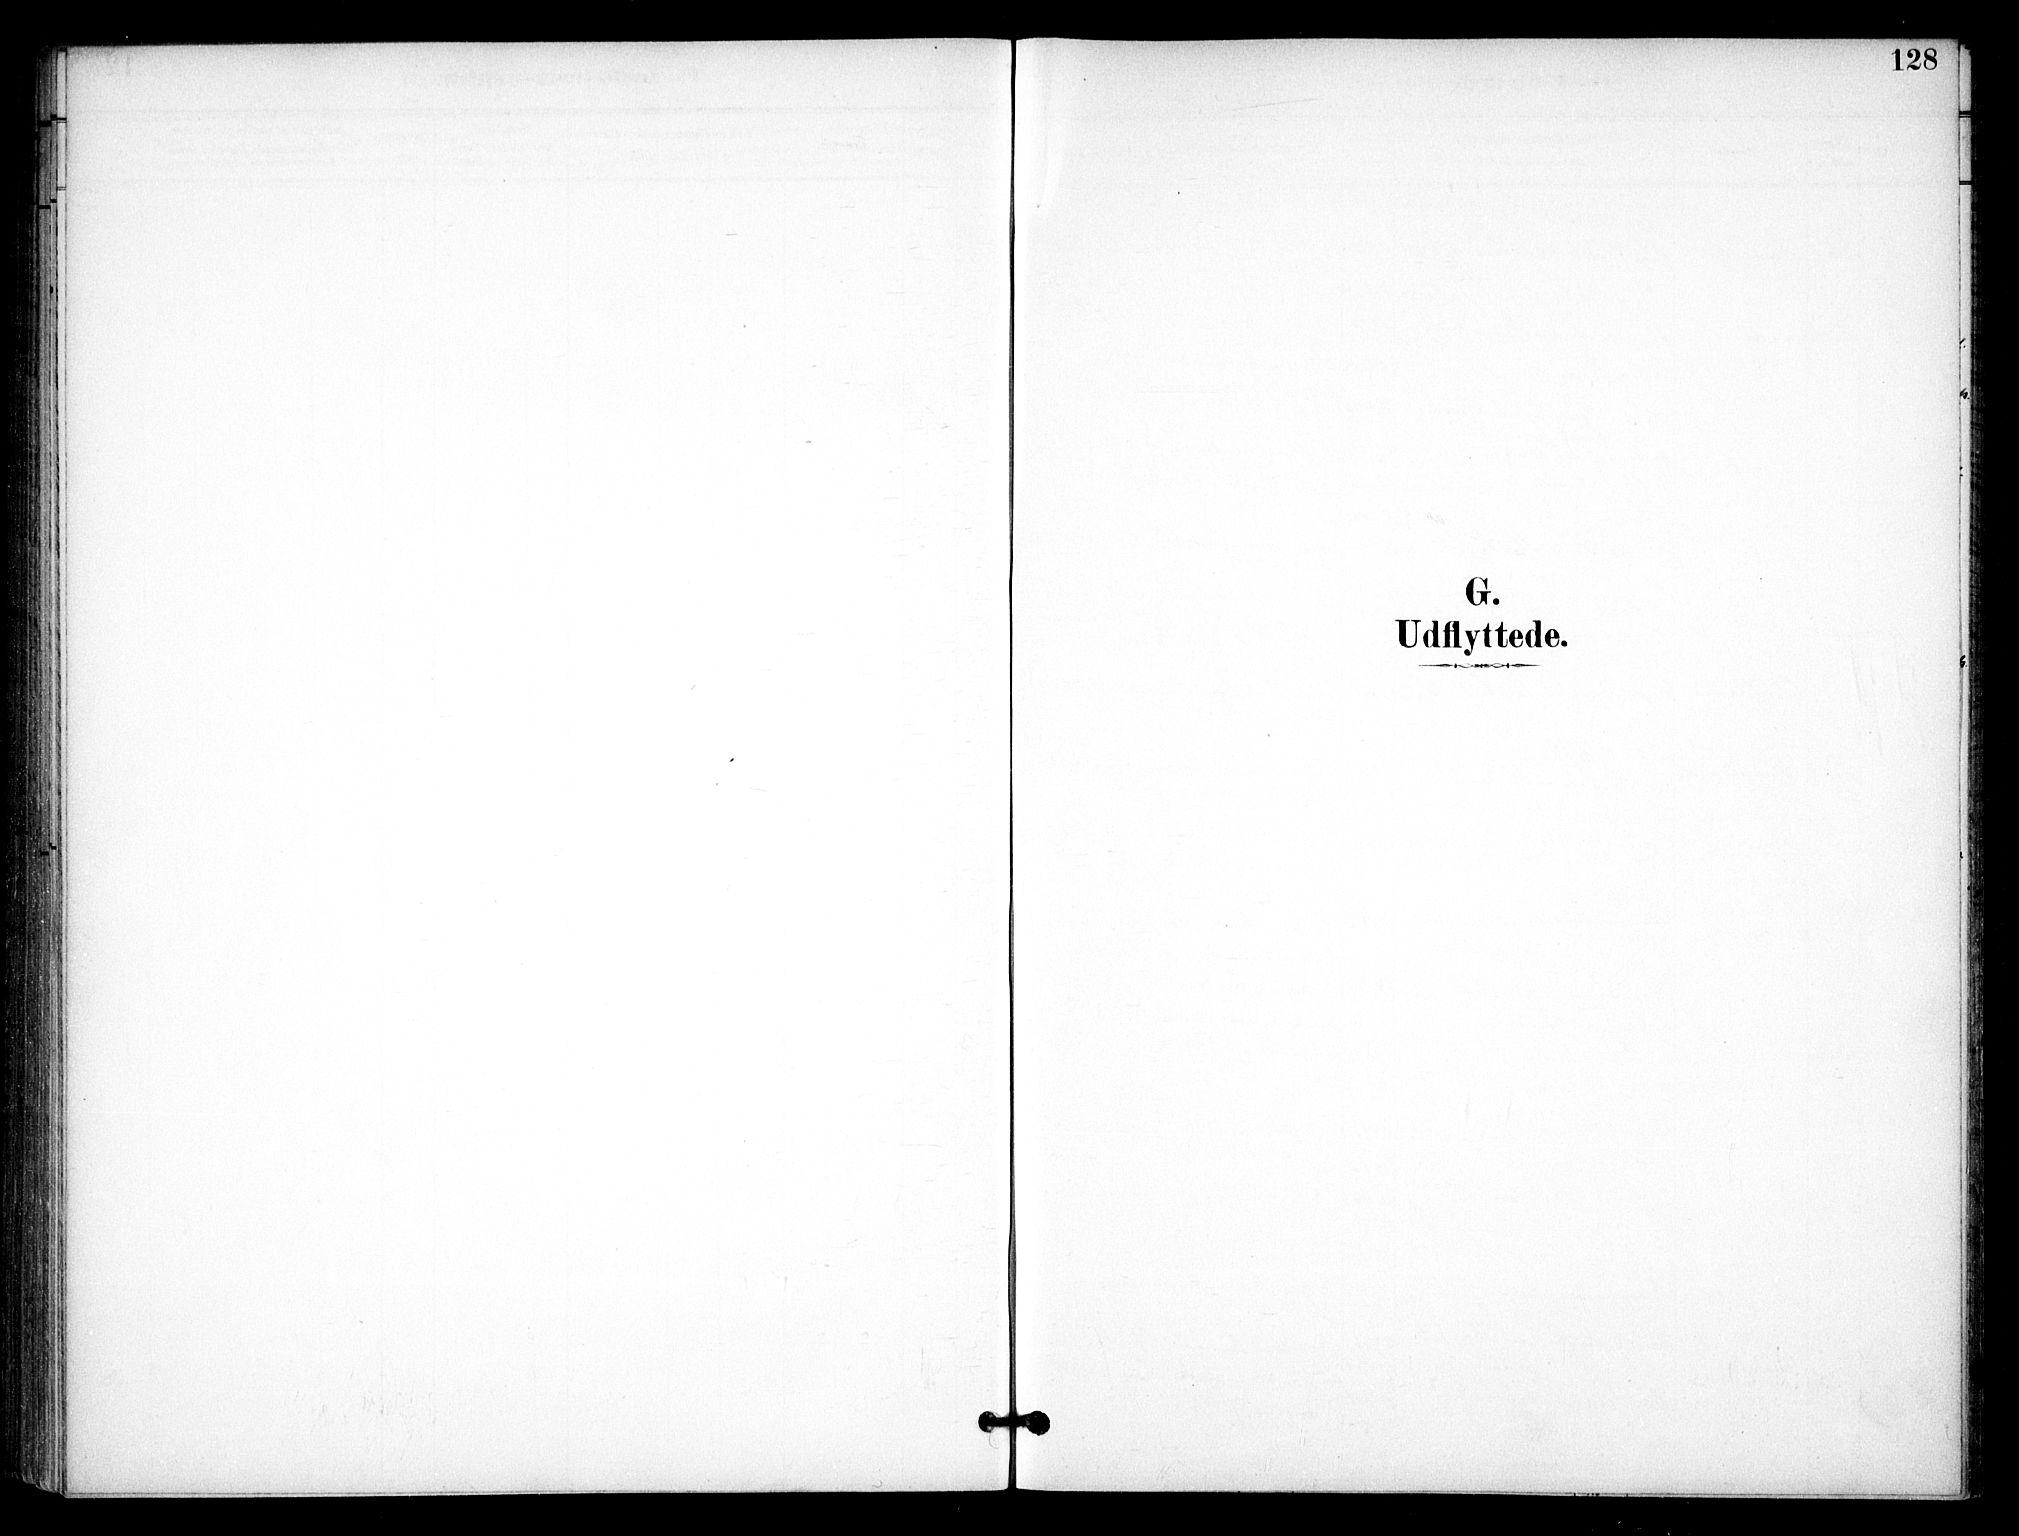 SAO, Nannestad prestekontor Kirkebøker, F/Fb/L0002: Ministerialbok nr. II 2, 1891-1909, s. 128